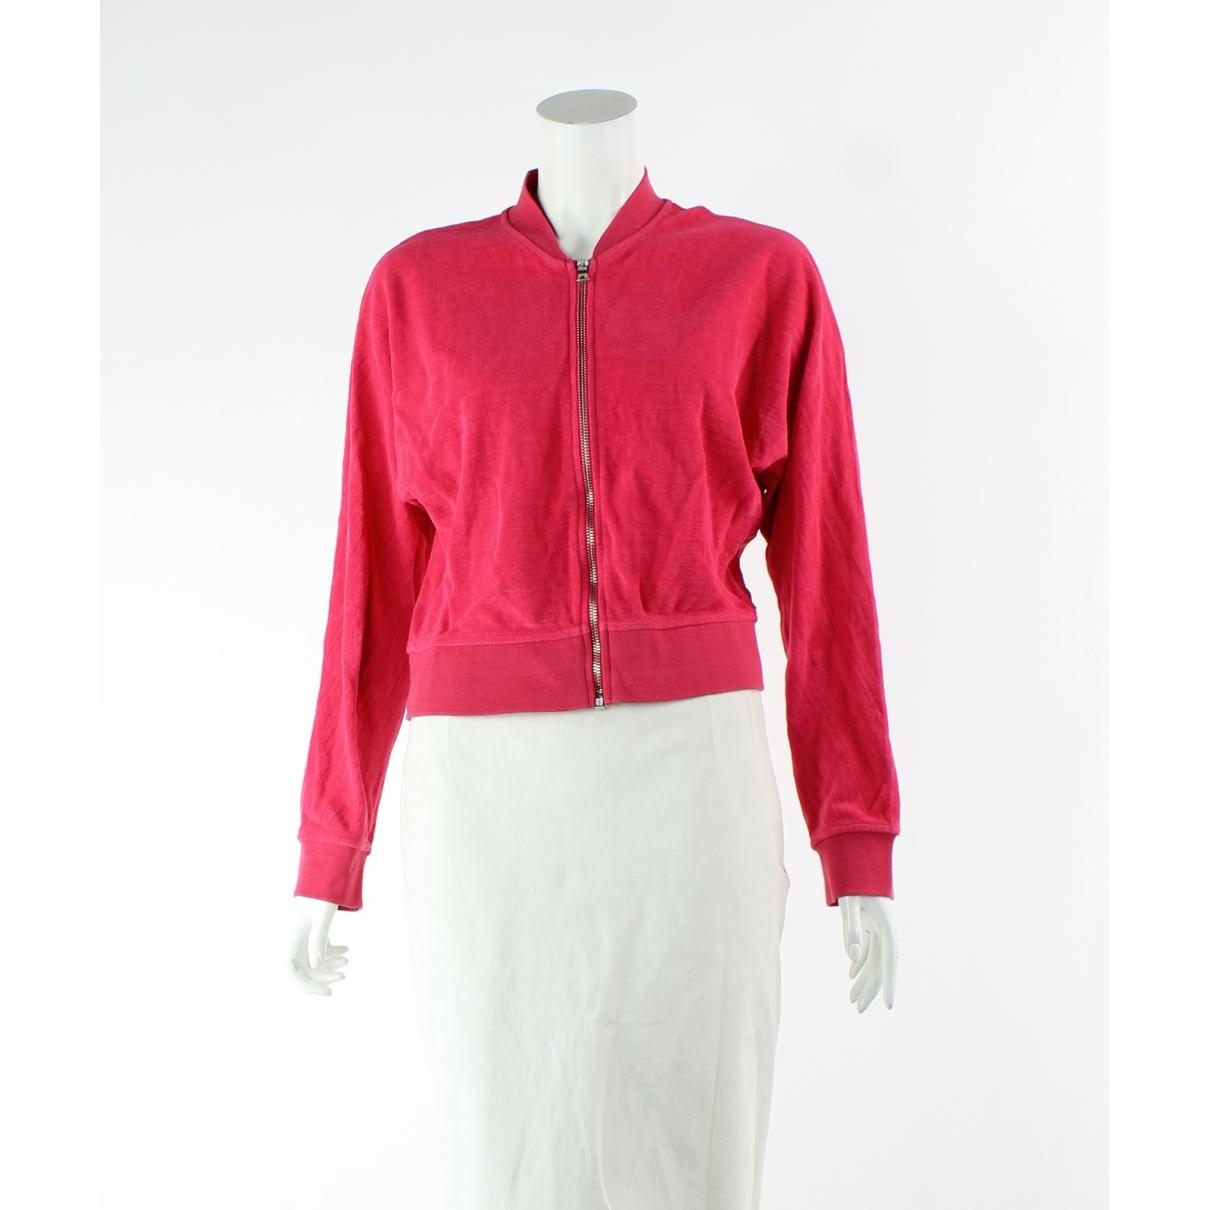 Orlebar Brown \N Red Cotton  top for Women M International